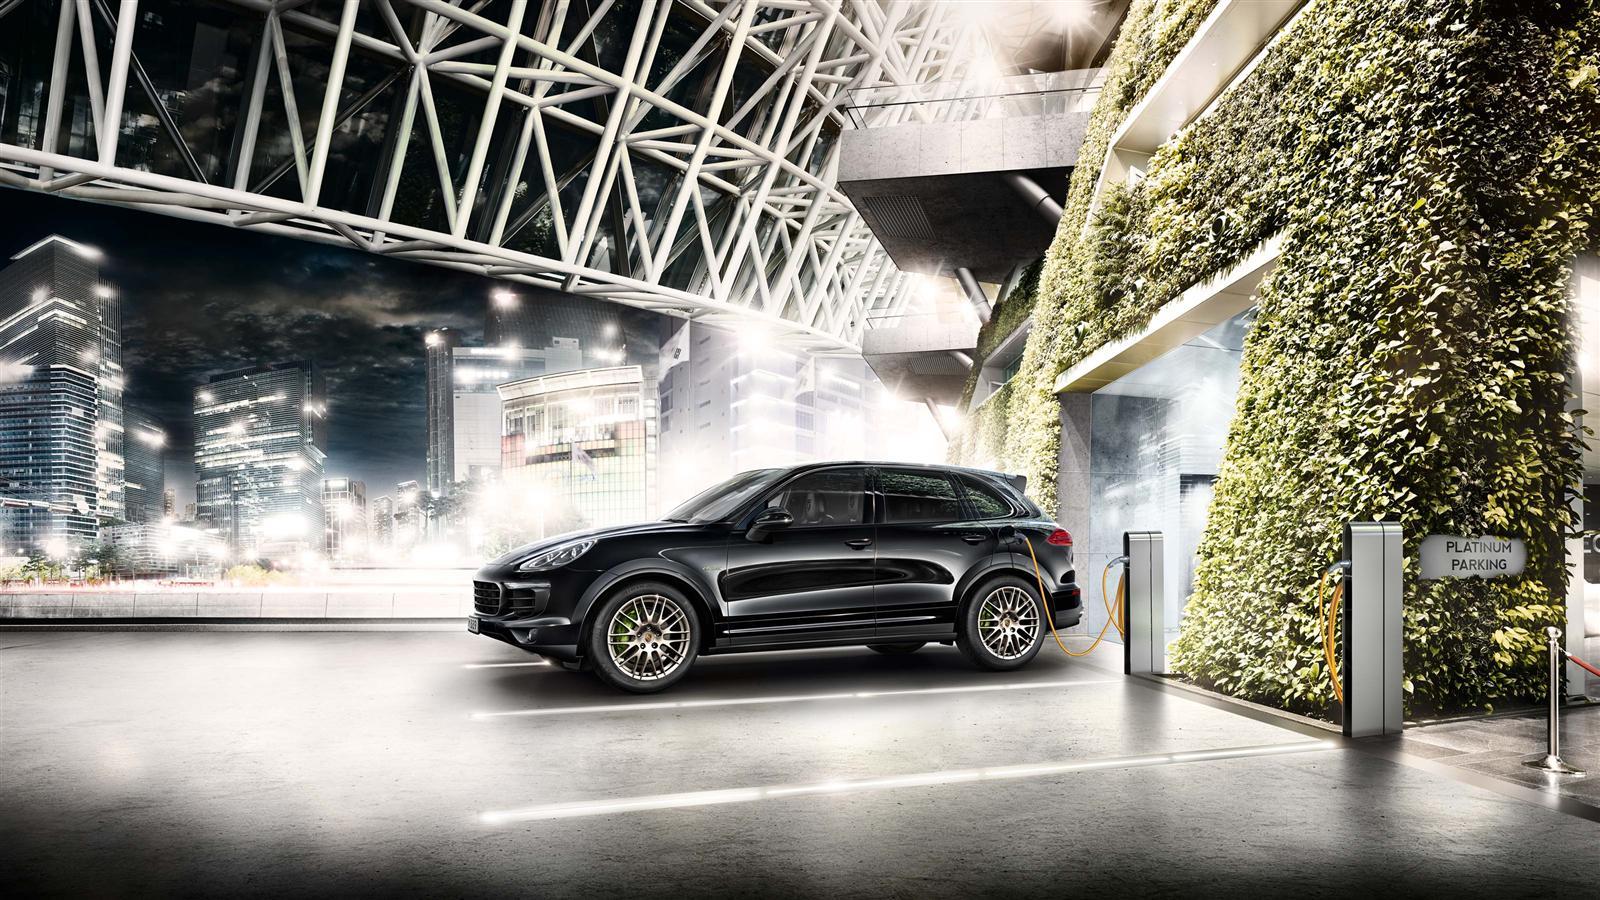 Porsche-Cayenne-S-E-Hybrid-Platinum-Edition-Charge.jpg